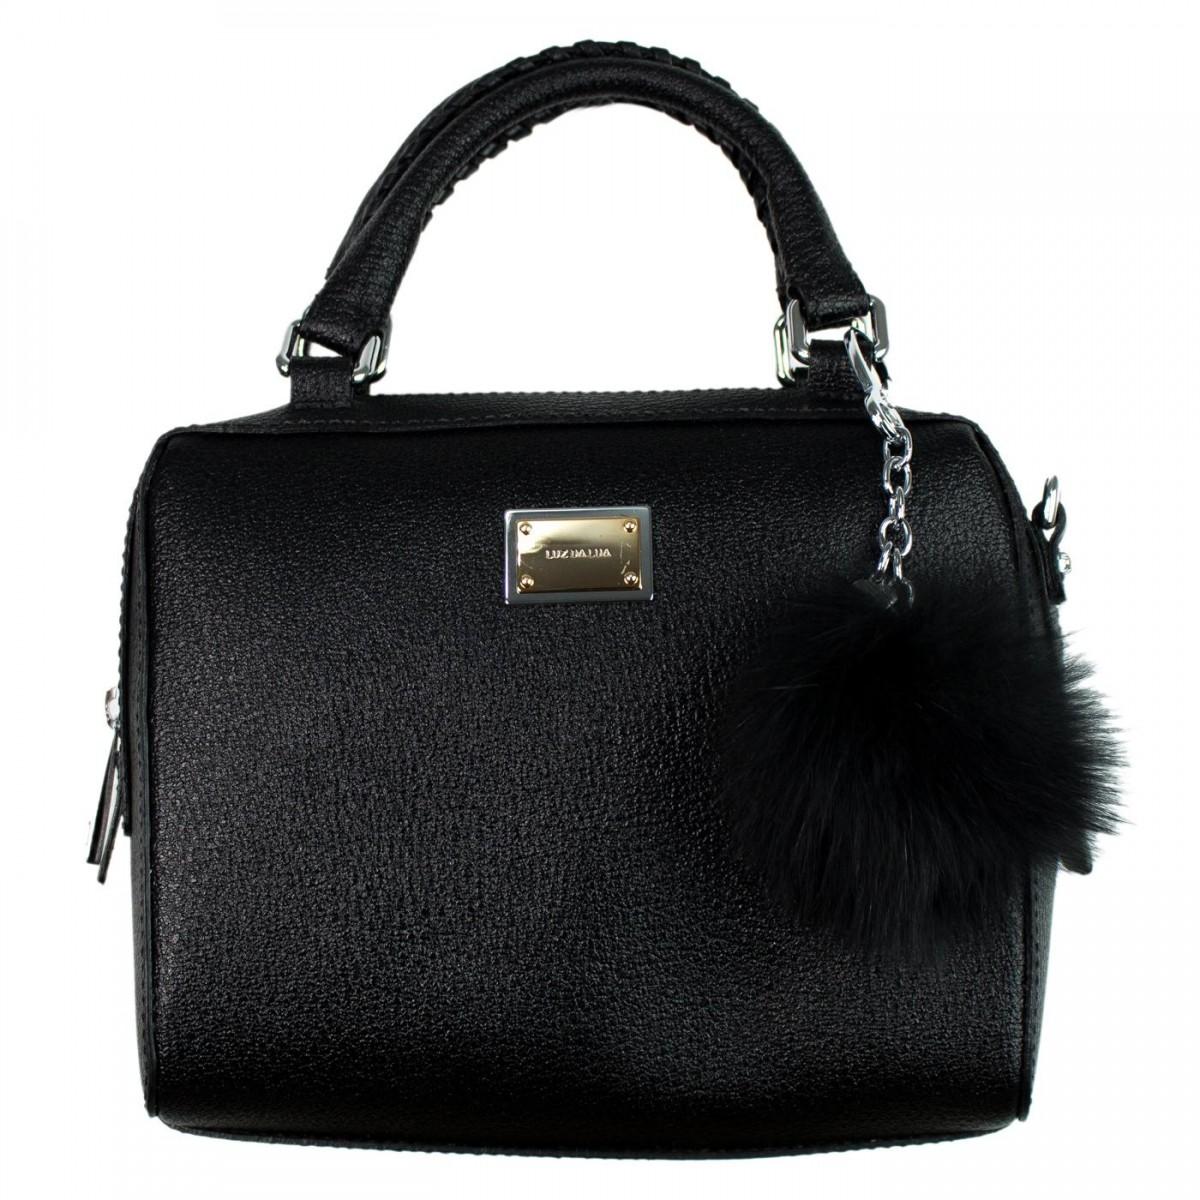 Bolsa De Couro Preta Luz Da Lua : Bizz store bolsa feminina luz da lua bacco couro preta